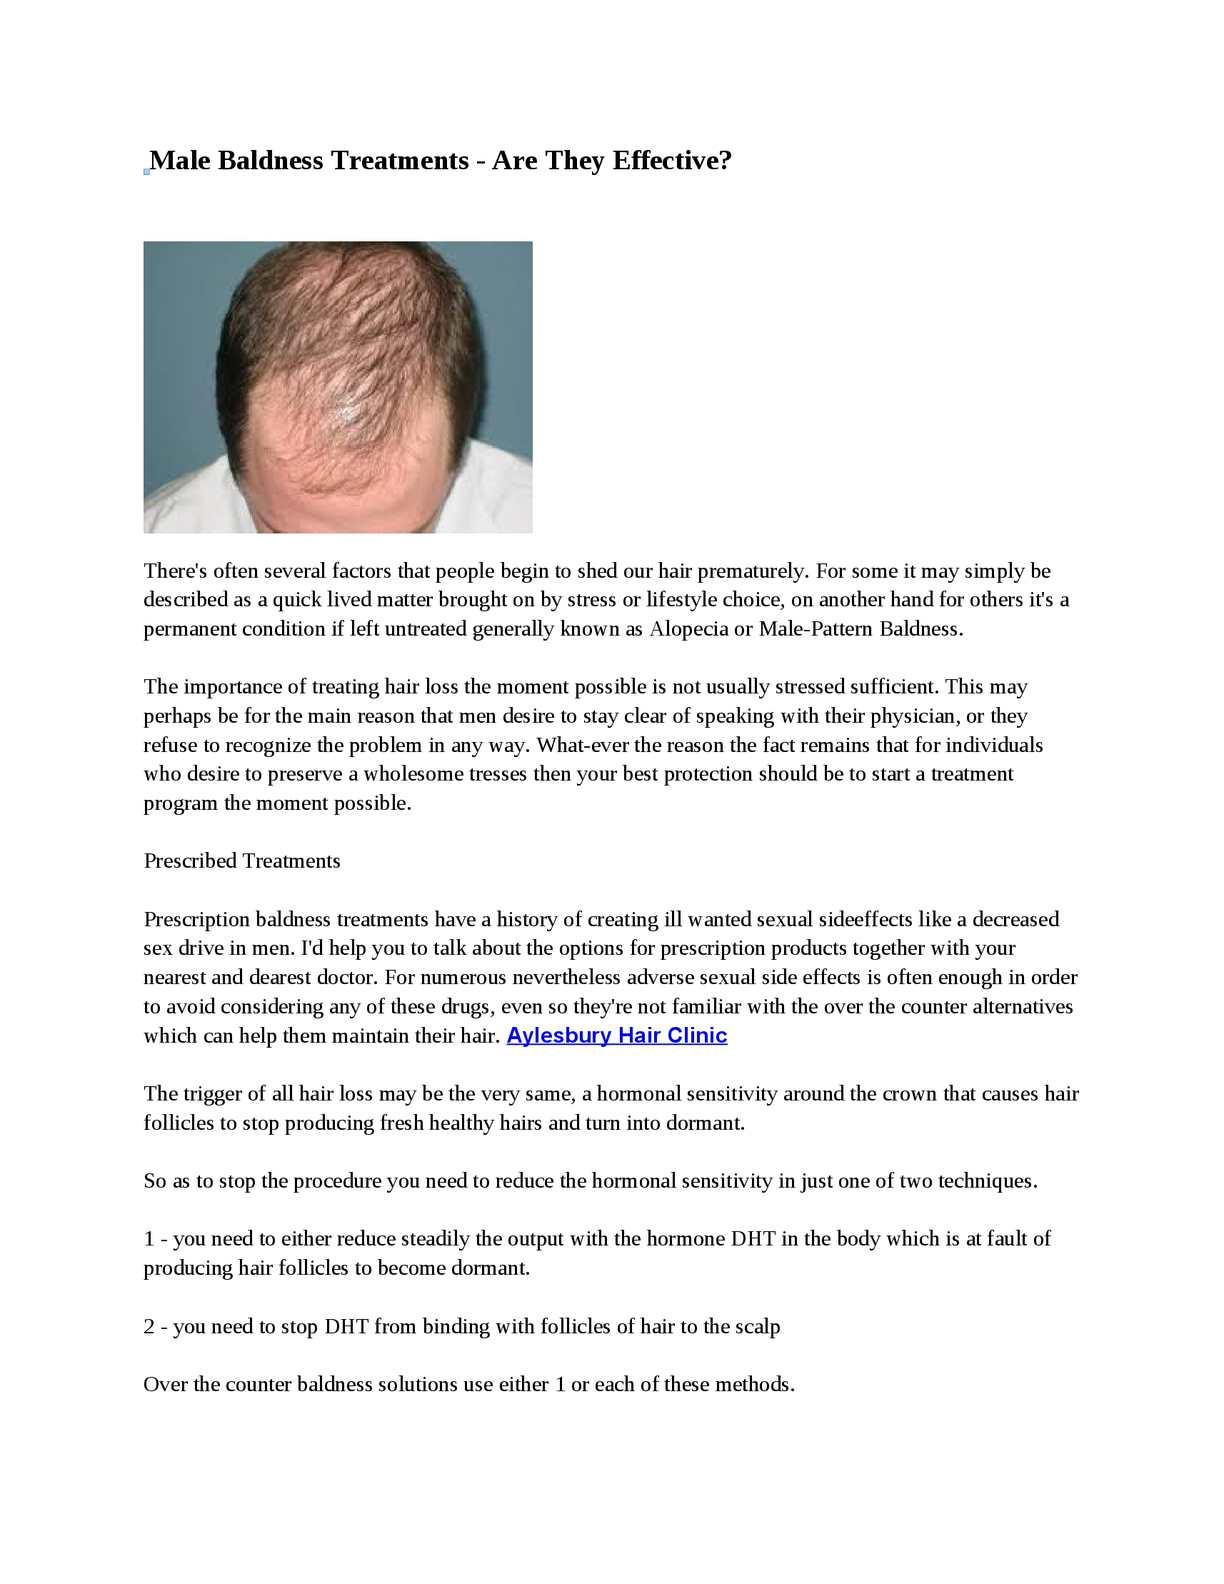 Calaméo - Male Baldness Treatments